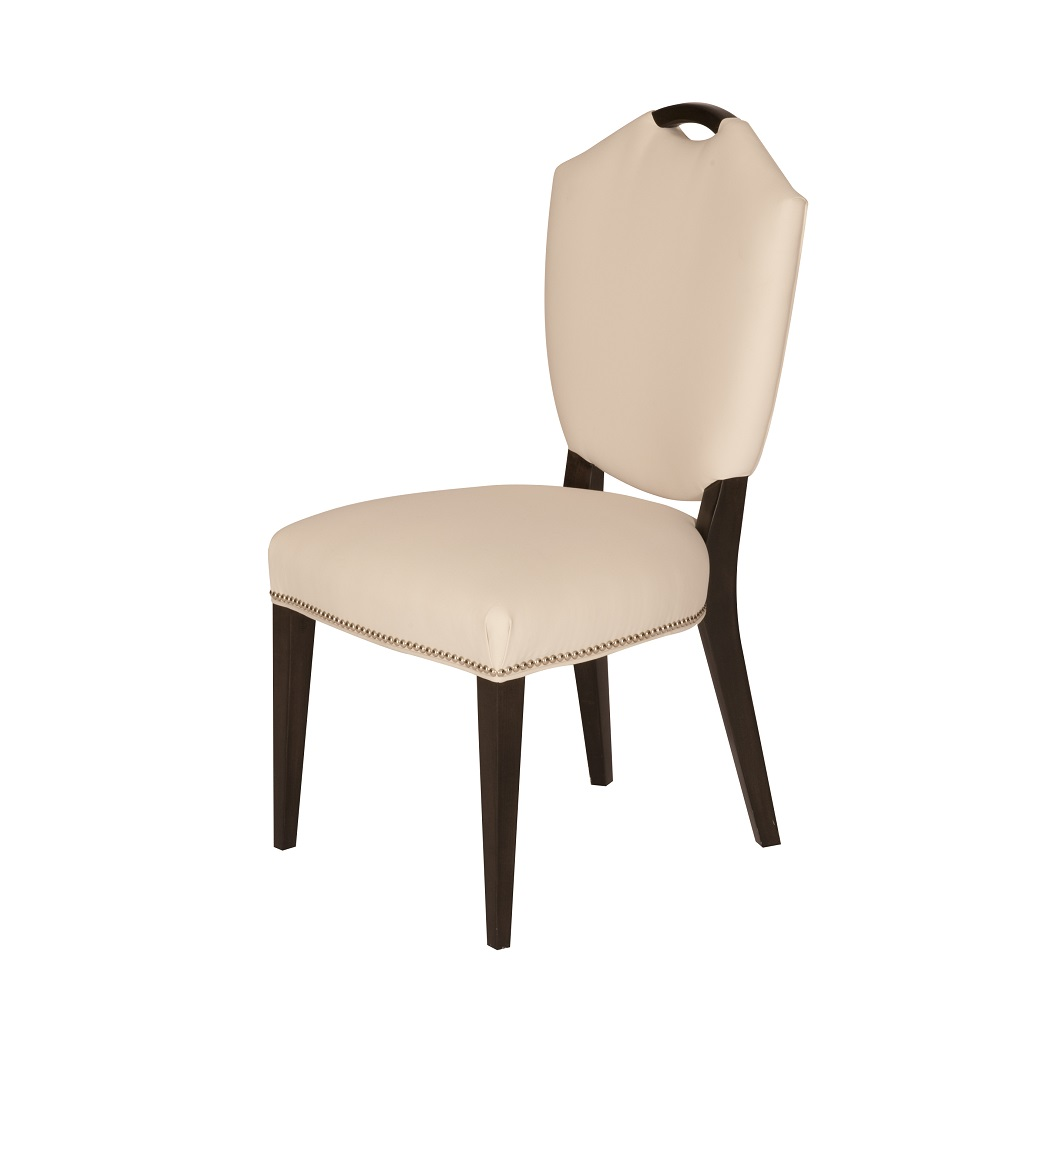 Sheer Chair